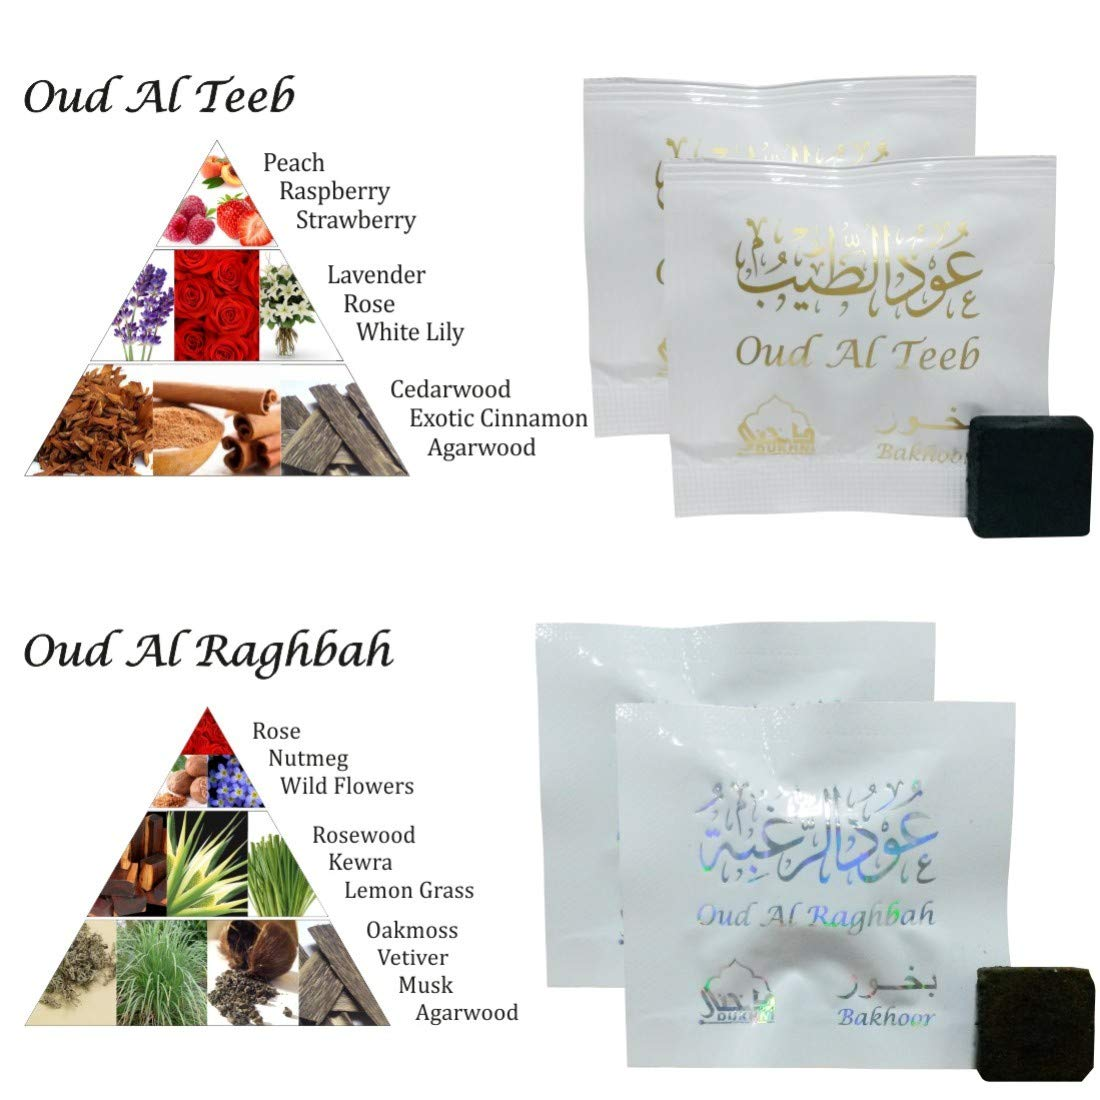 Dukhni Oud Bakhoor Incense Variety Box & Rainbow Bakhoor Burner - Gift Set & Starter Kit by Dukhni (Image #10)